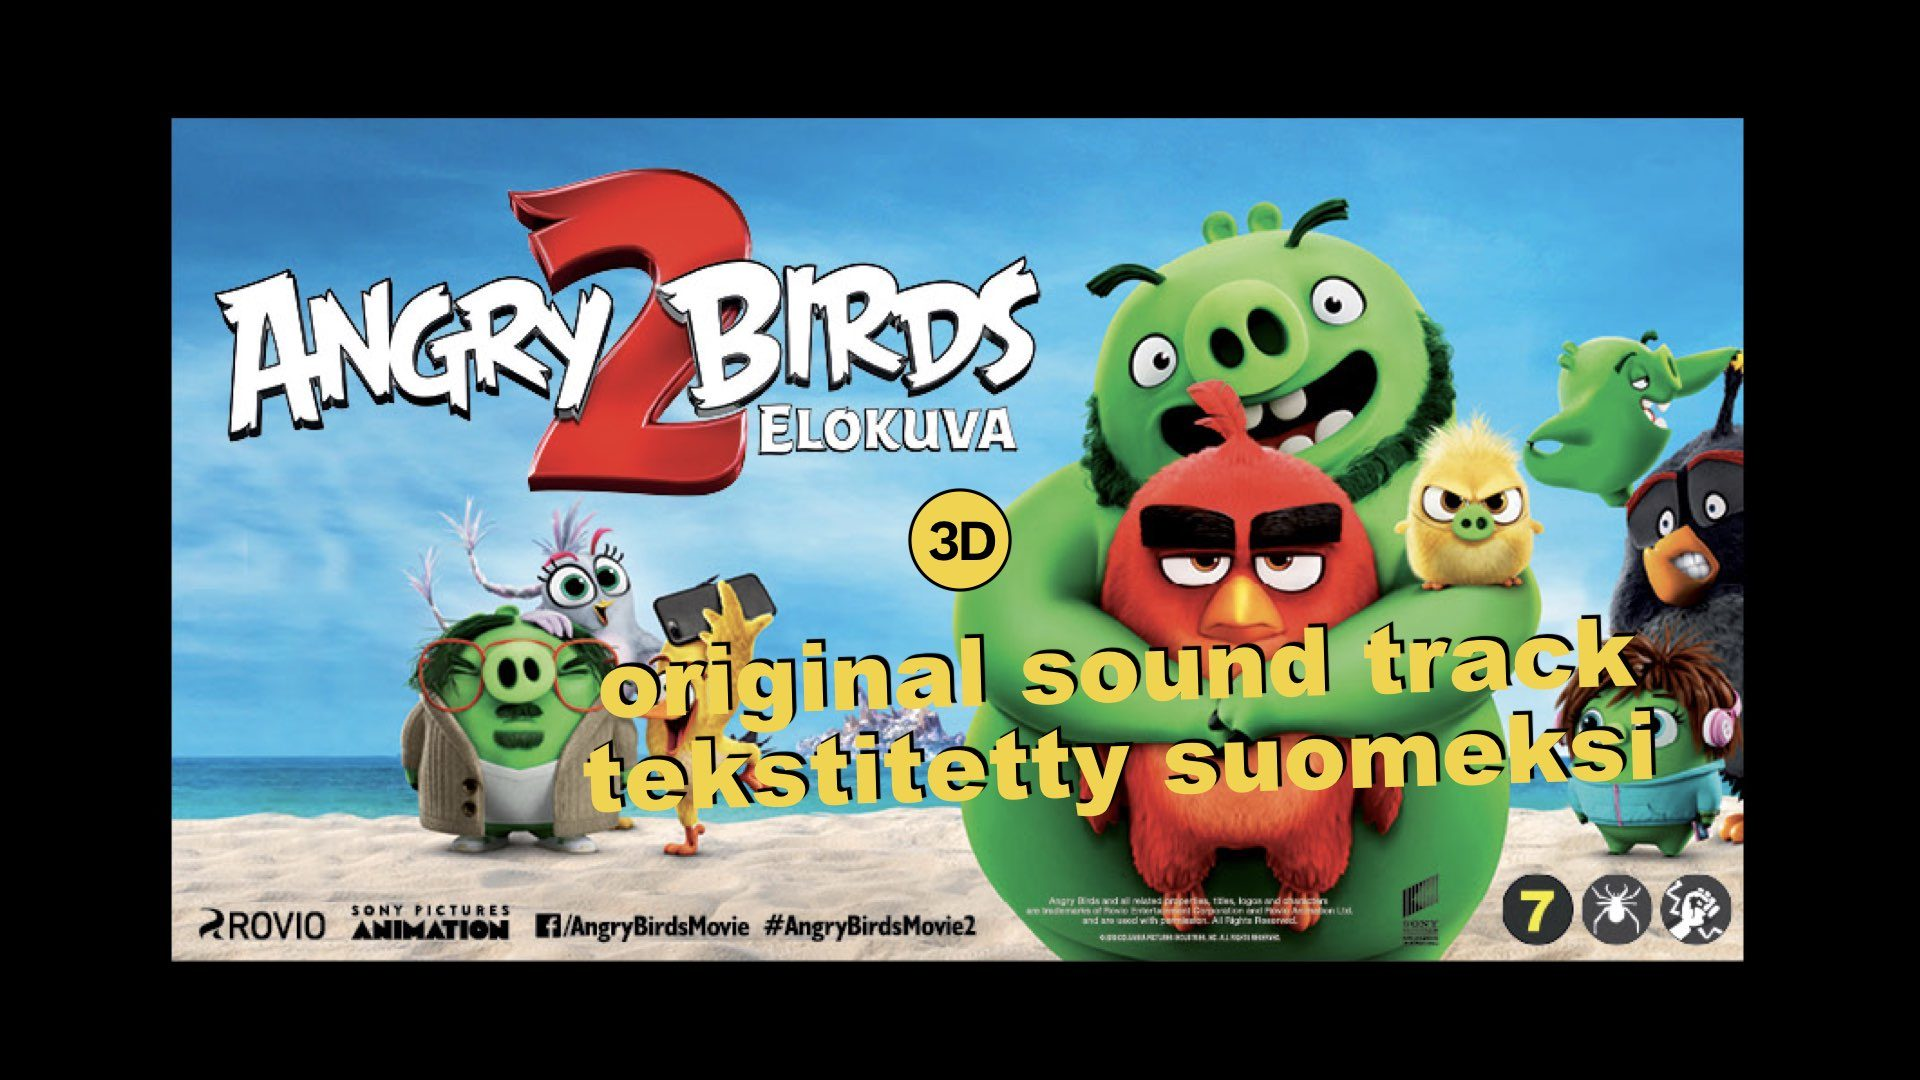 Angry Birds -elokuva 2 (3D orig sound)